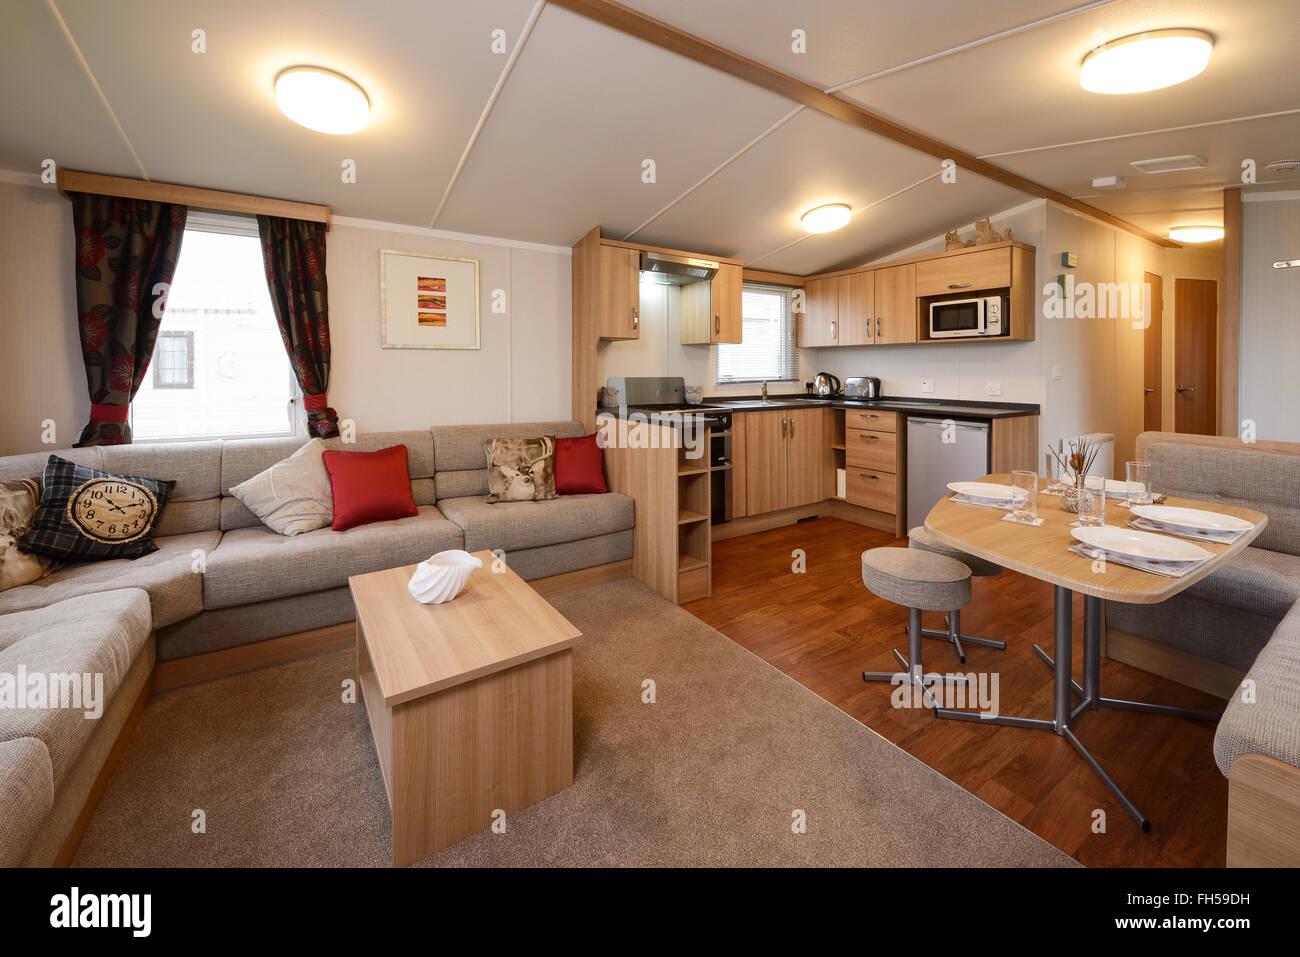 Interior of a static caravan showing living room kitchen for Small caravan interior designs